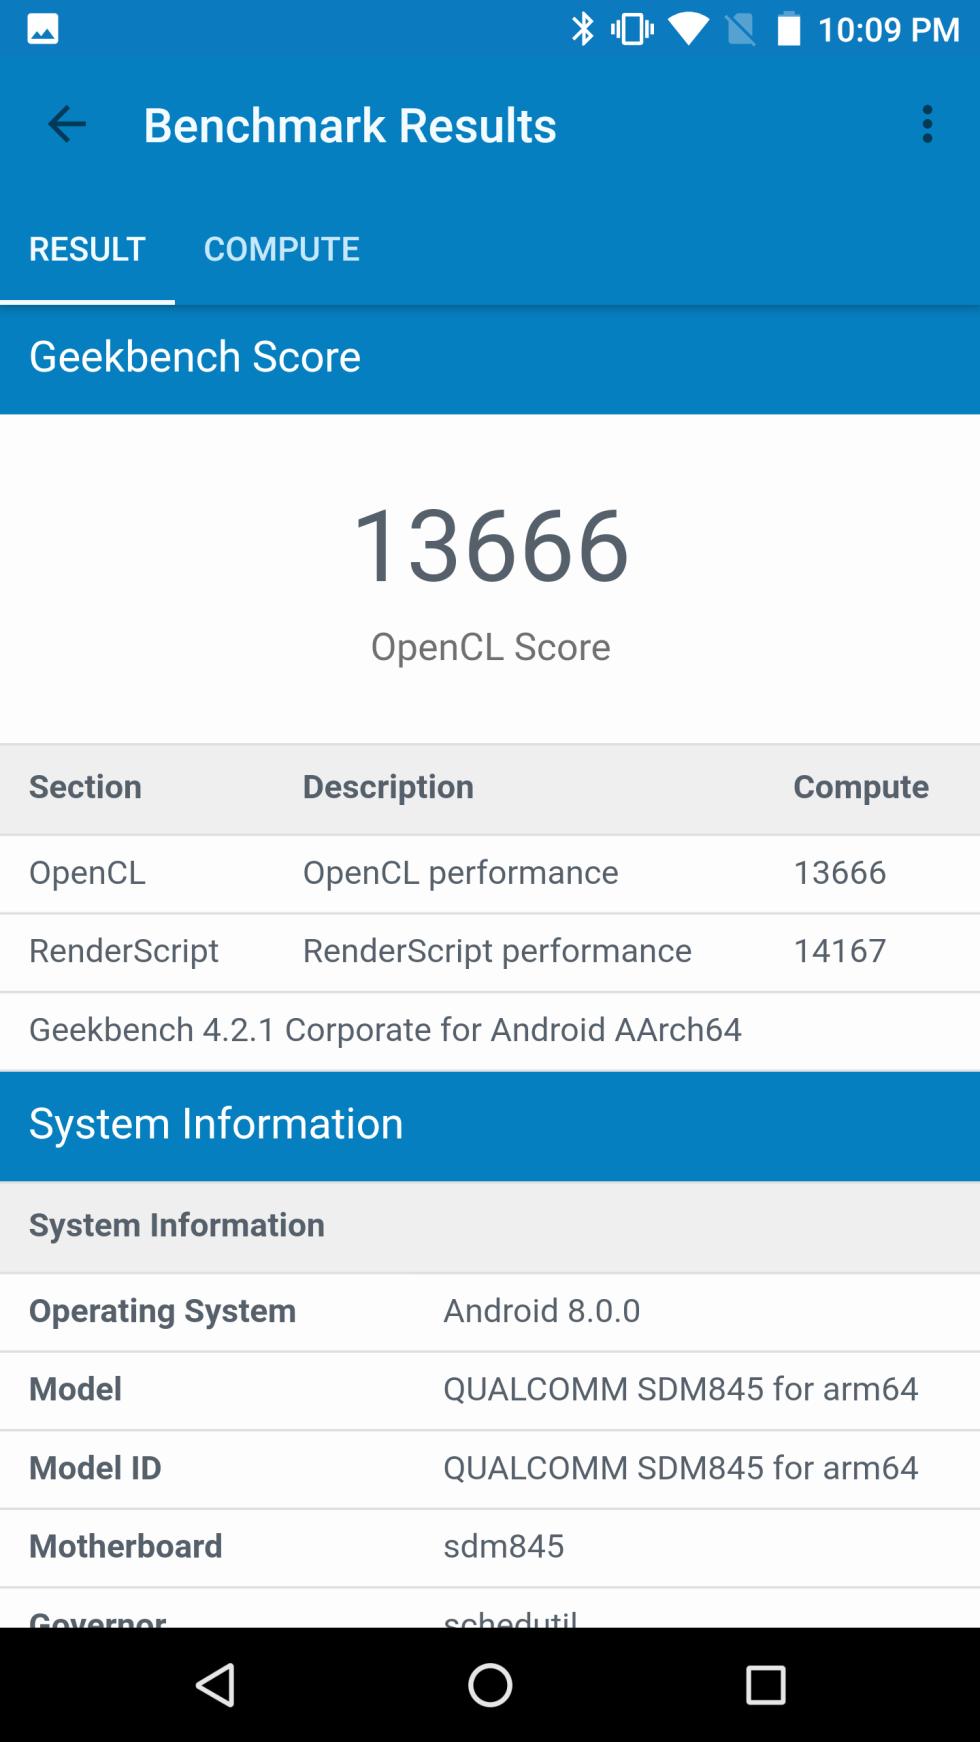 Benchmarks Snapdragon 845